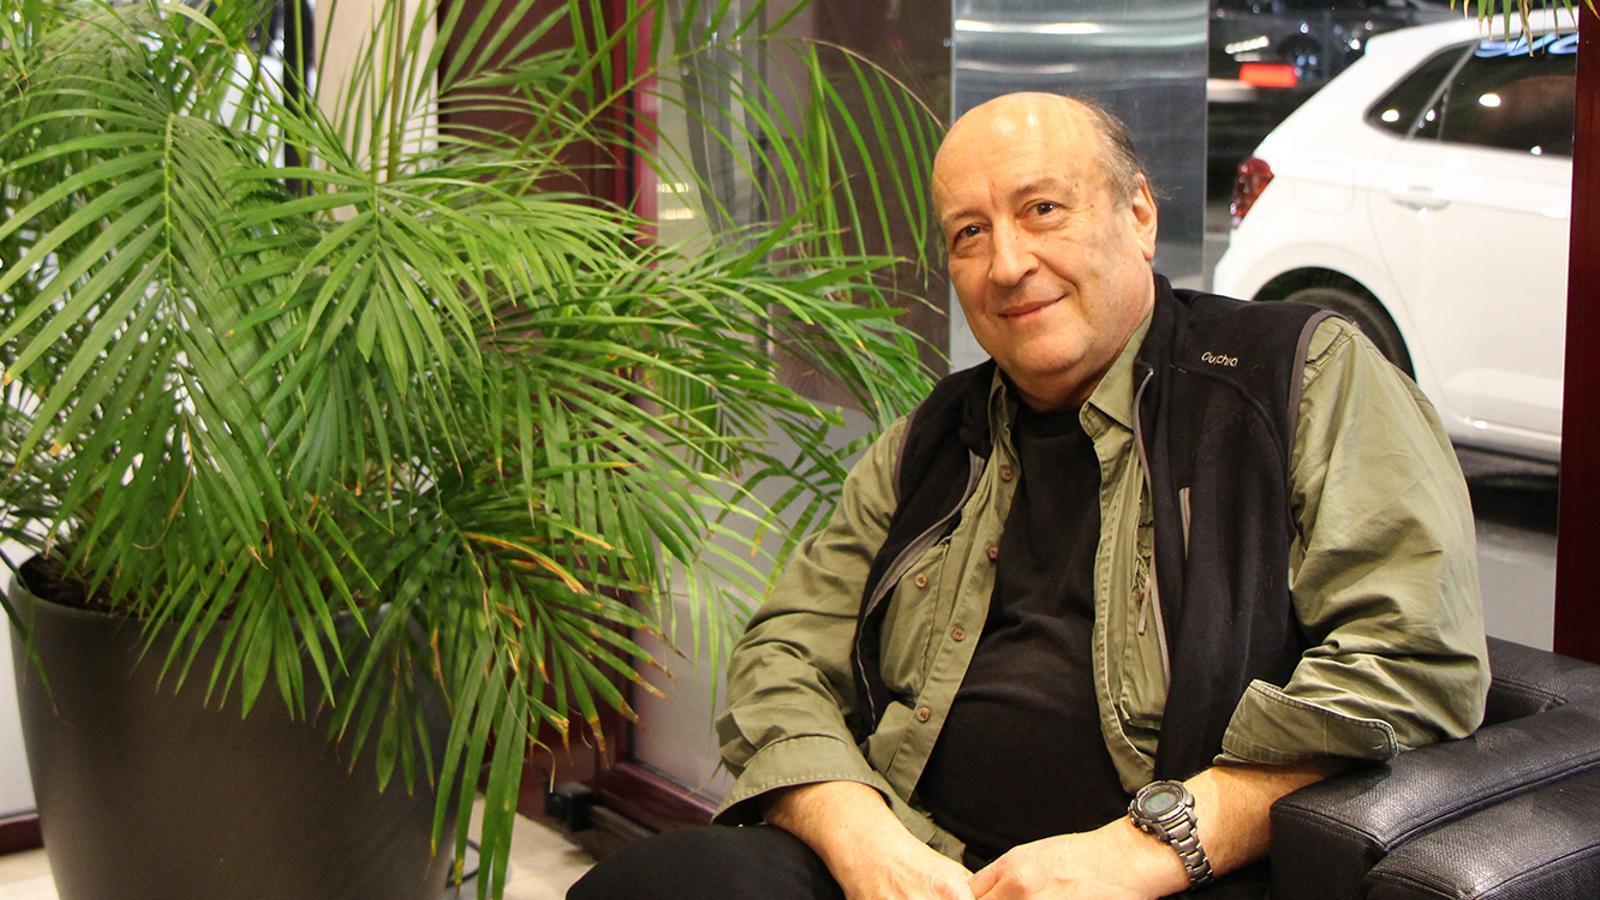 El científic i professor Pierre-Henri Gouyon, durant l'entrevista. / M. F. (ANA)